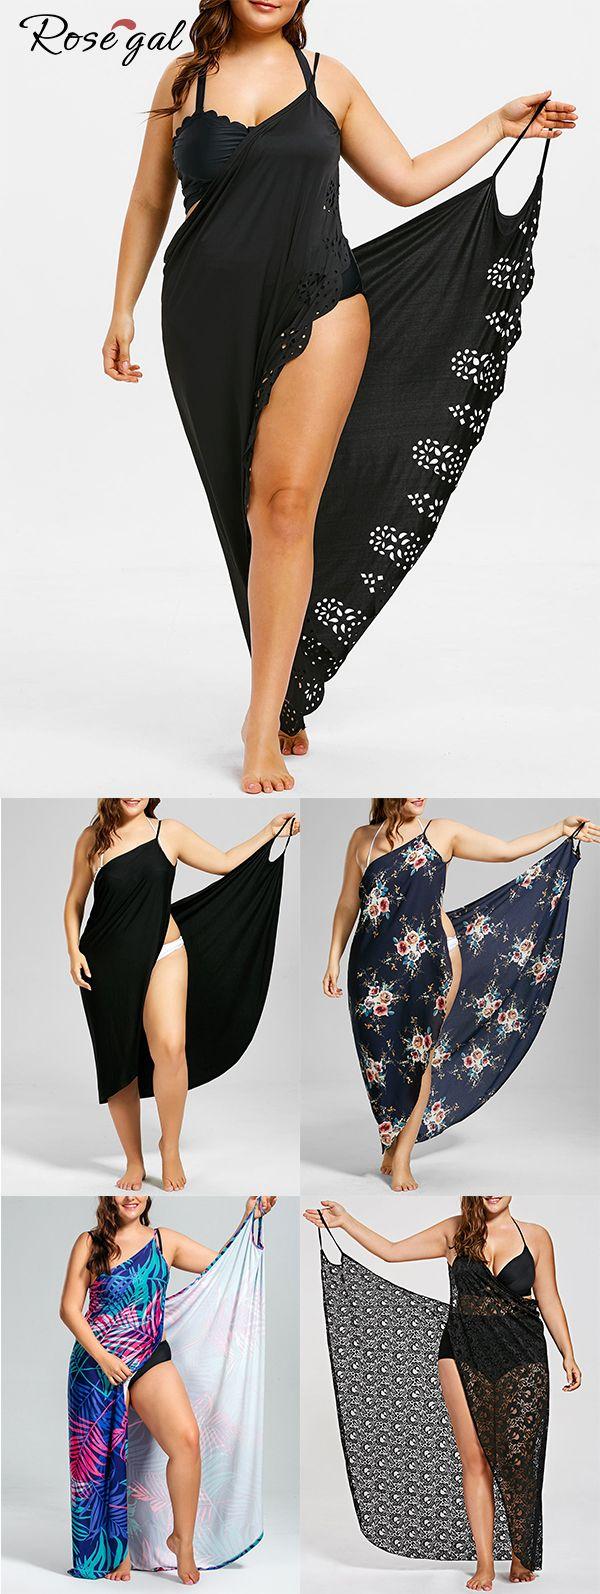 Rosegal plus size  bikini cover ups perfect for swimsuits